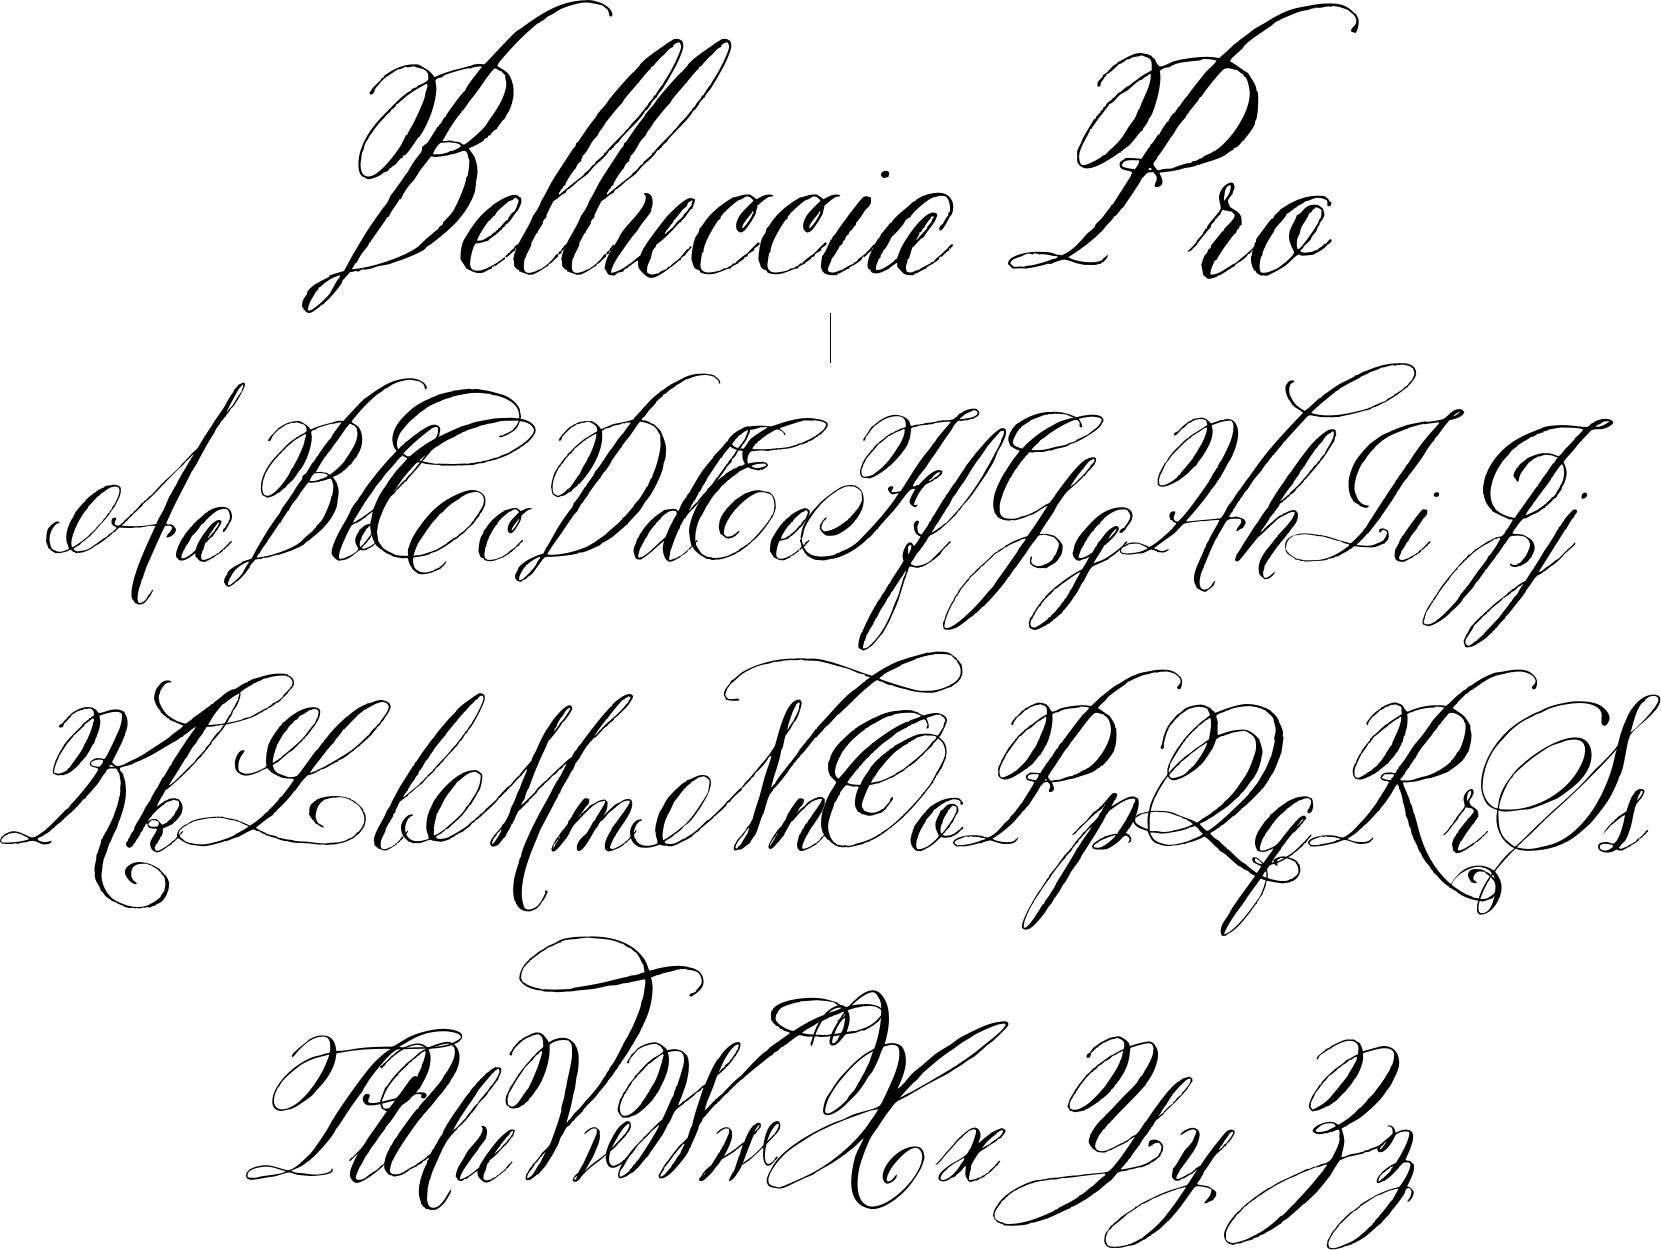 Belluccia pro font created with brides and invitation